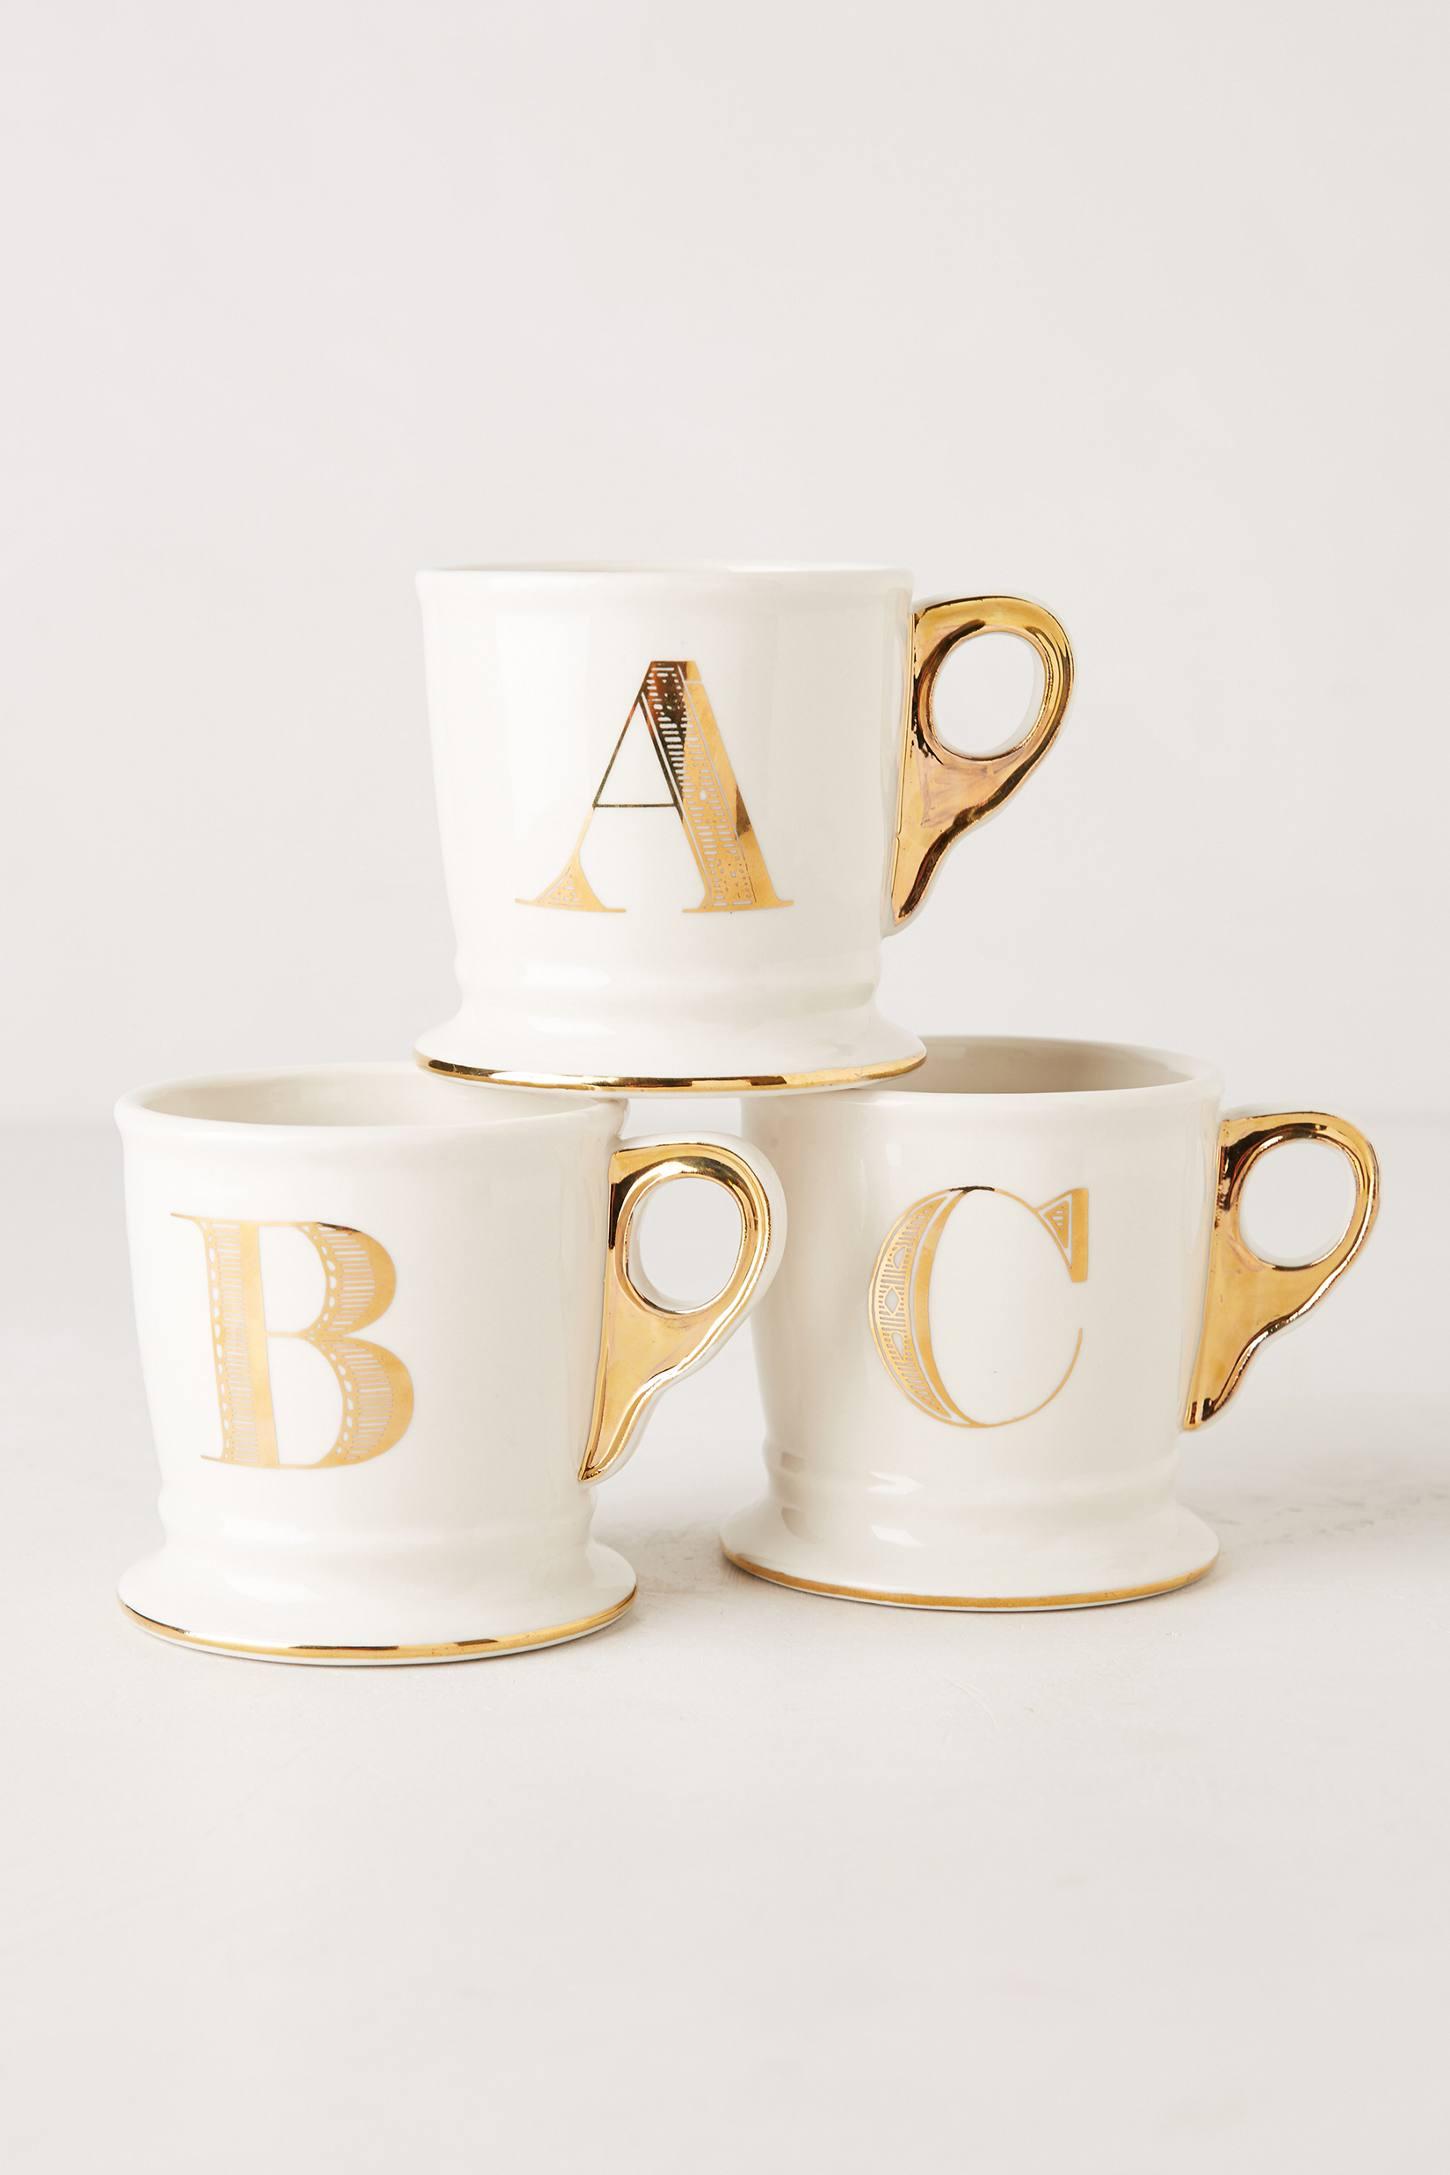 Image Result For Anthropologie Letter Mugs